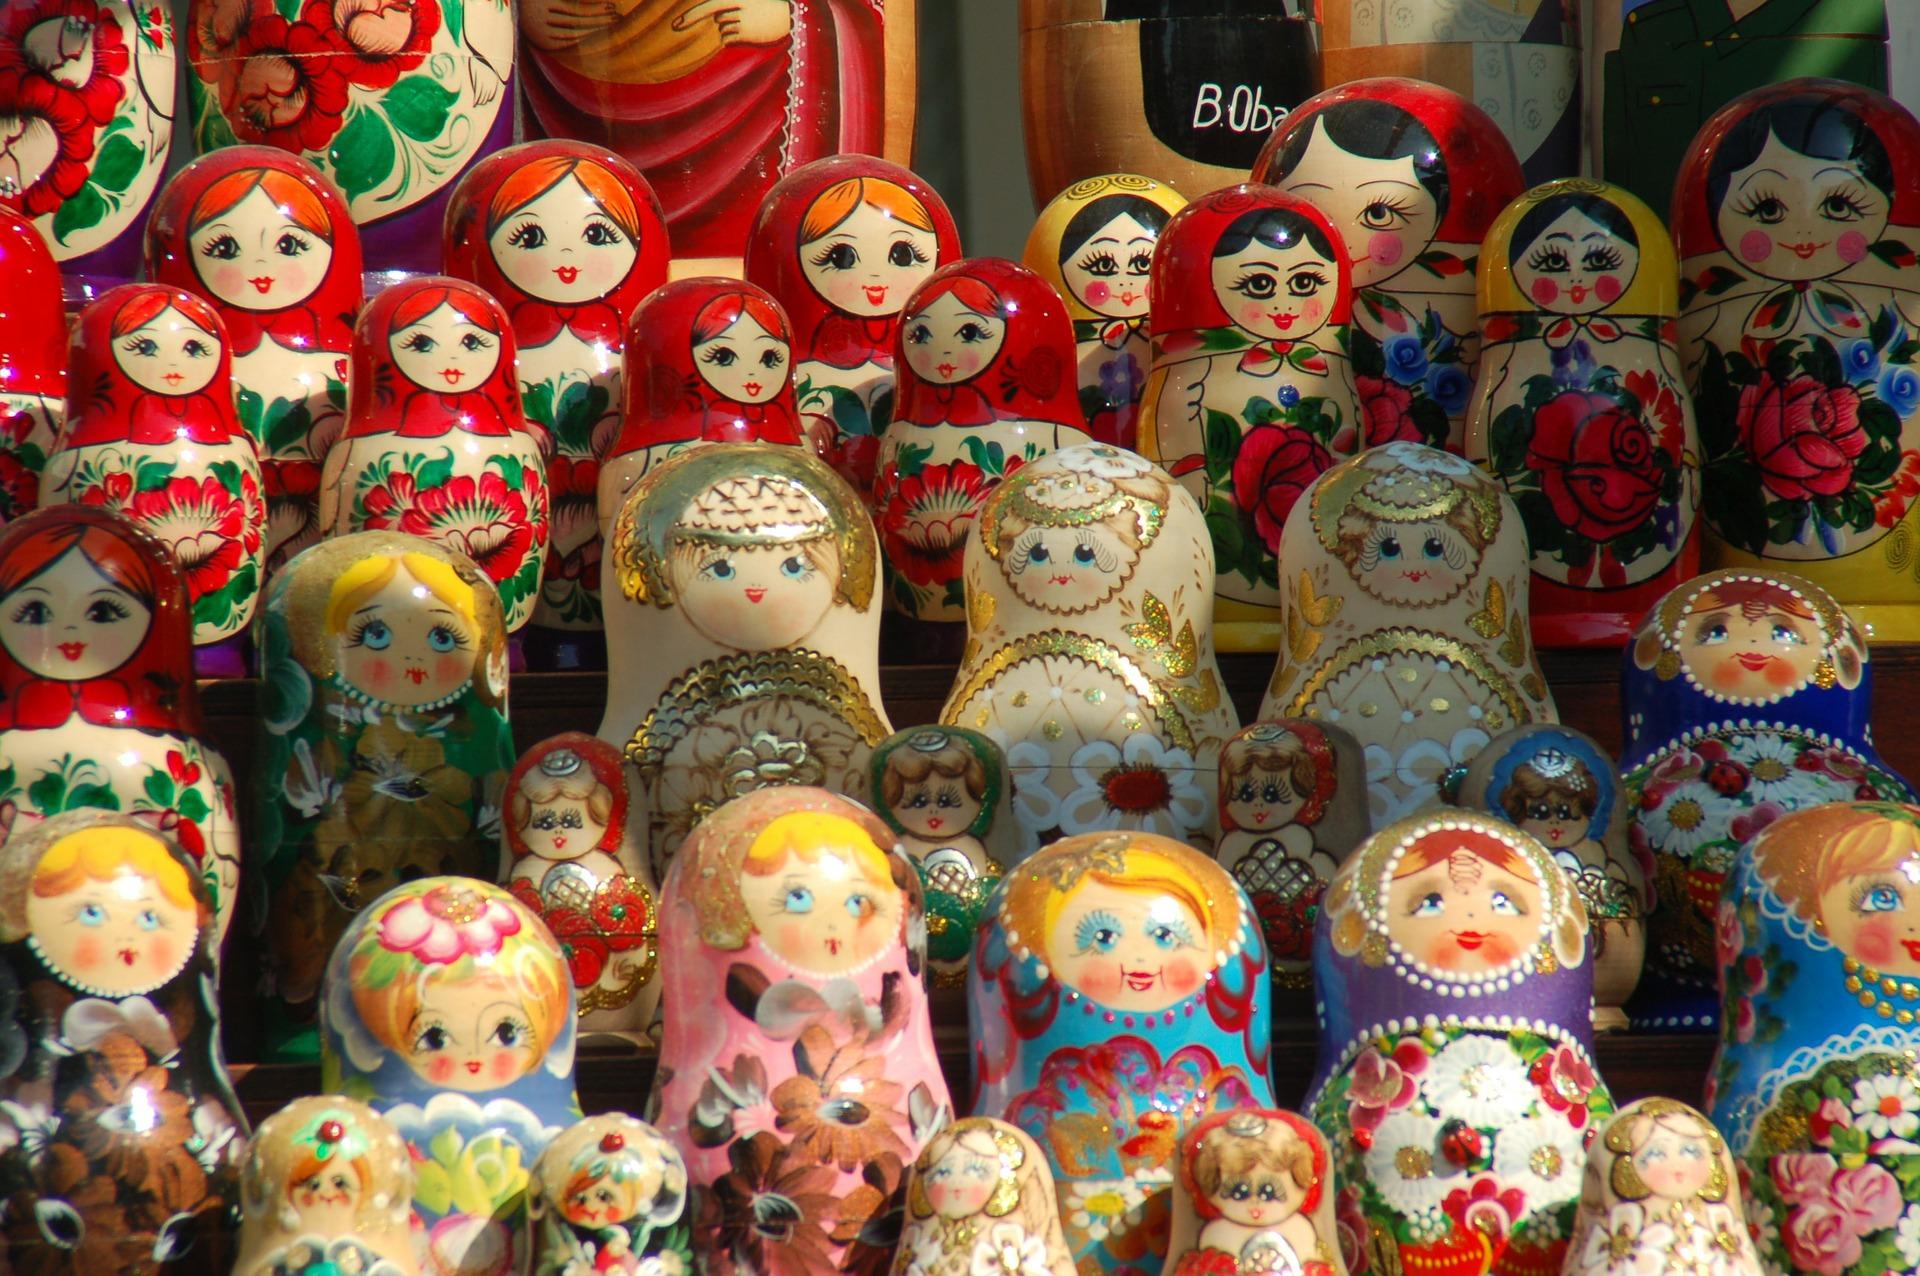 russian-dolls-345064_1920.jpg